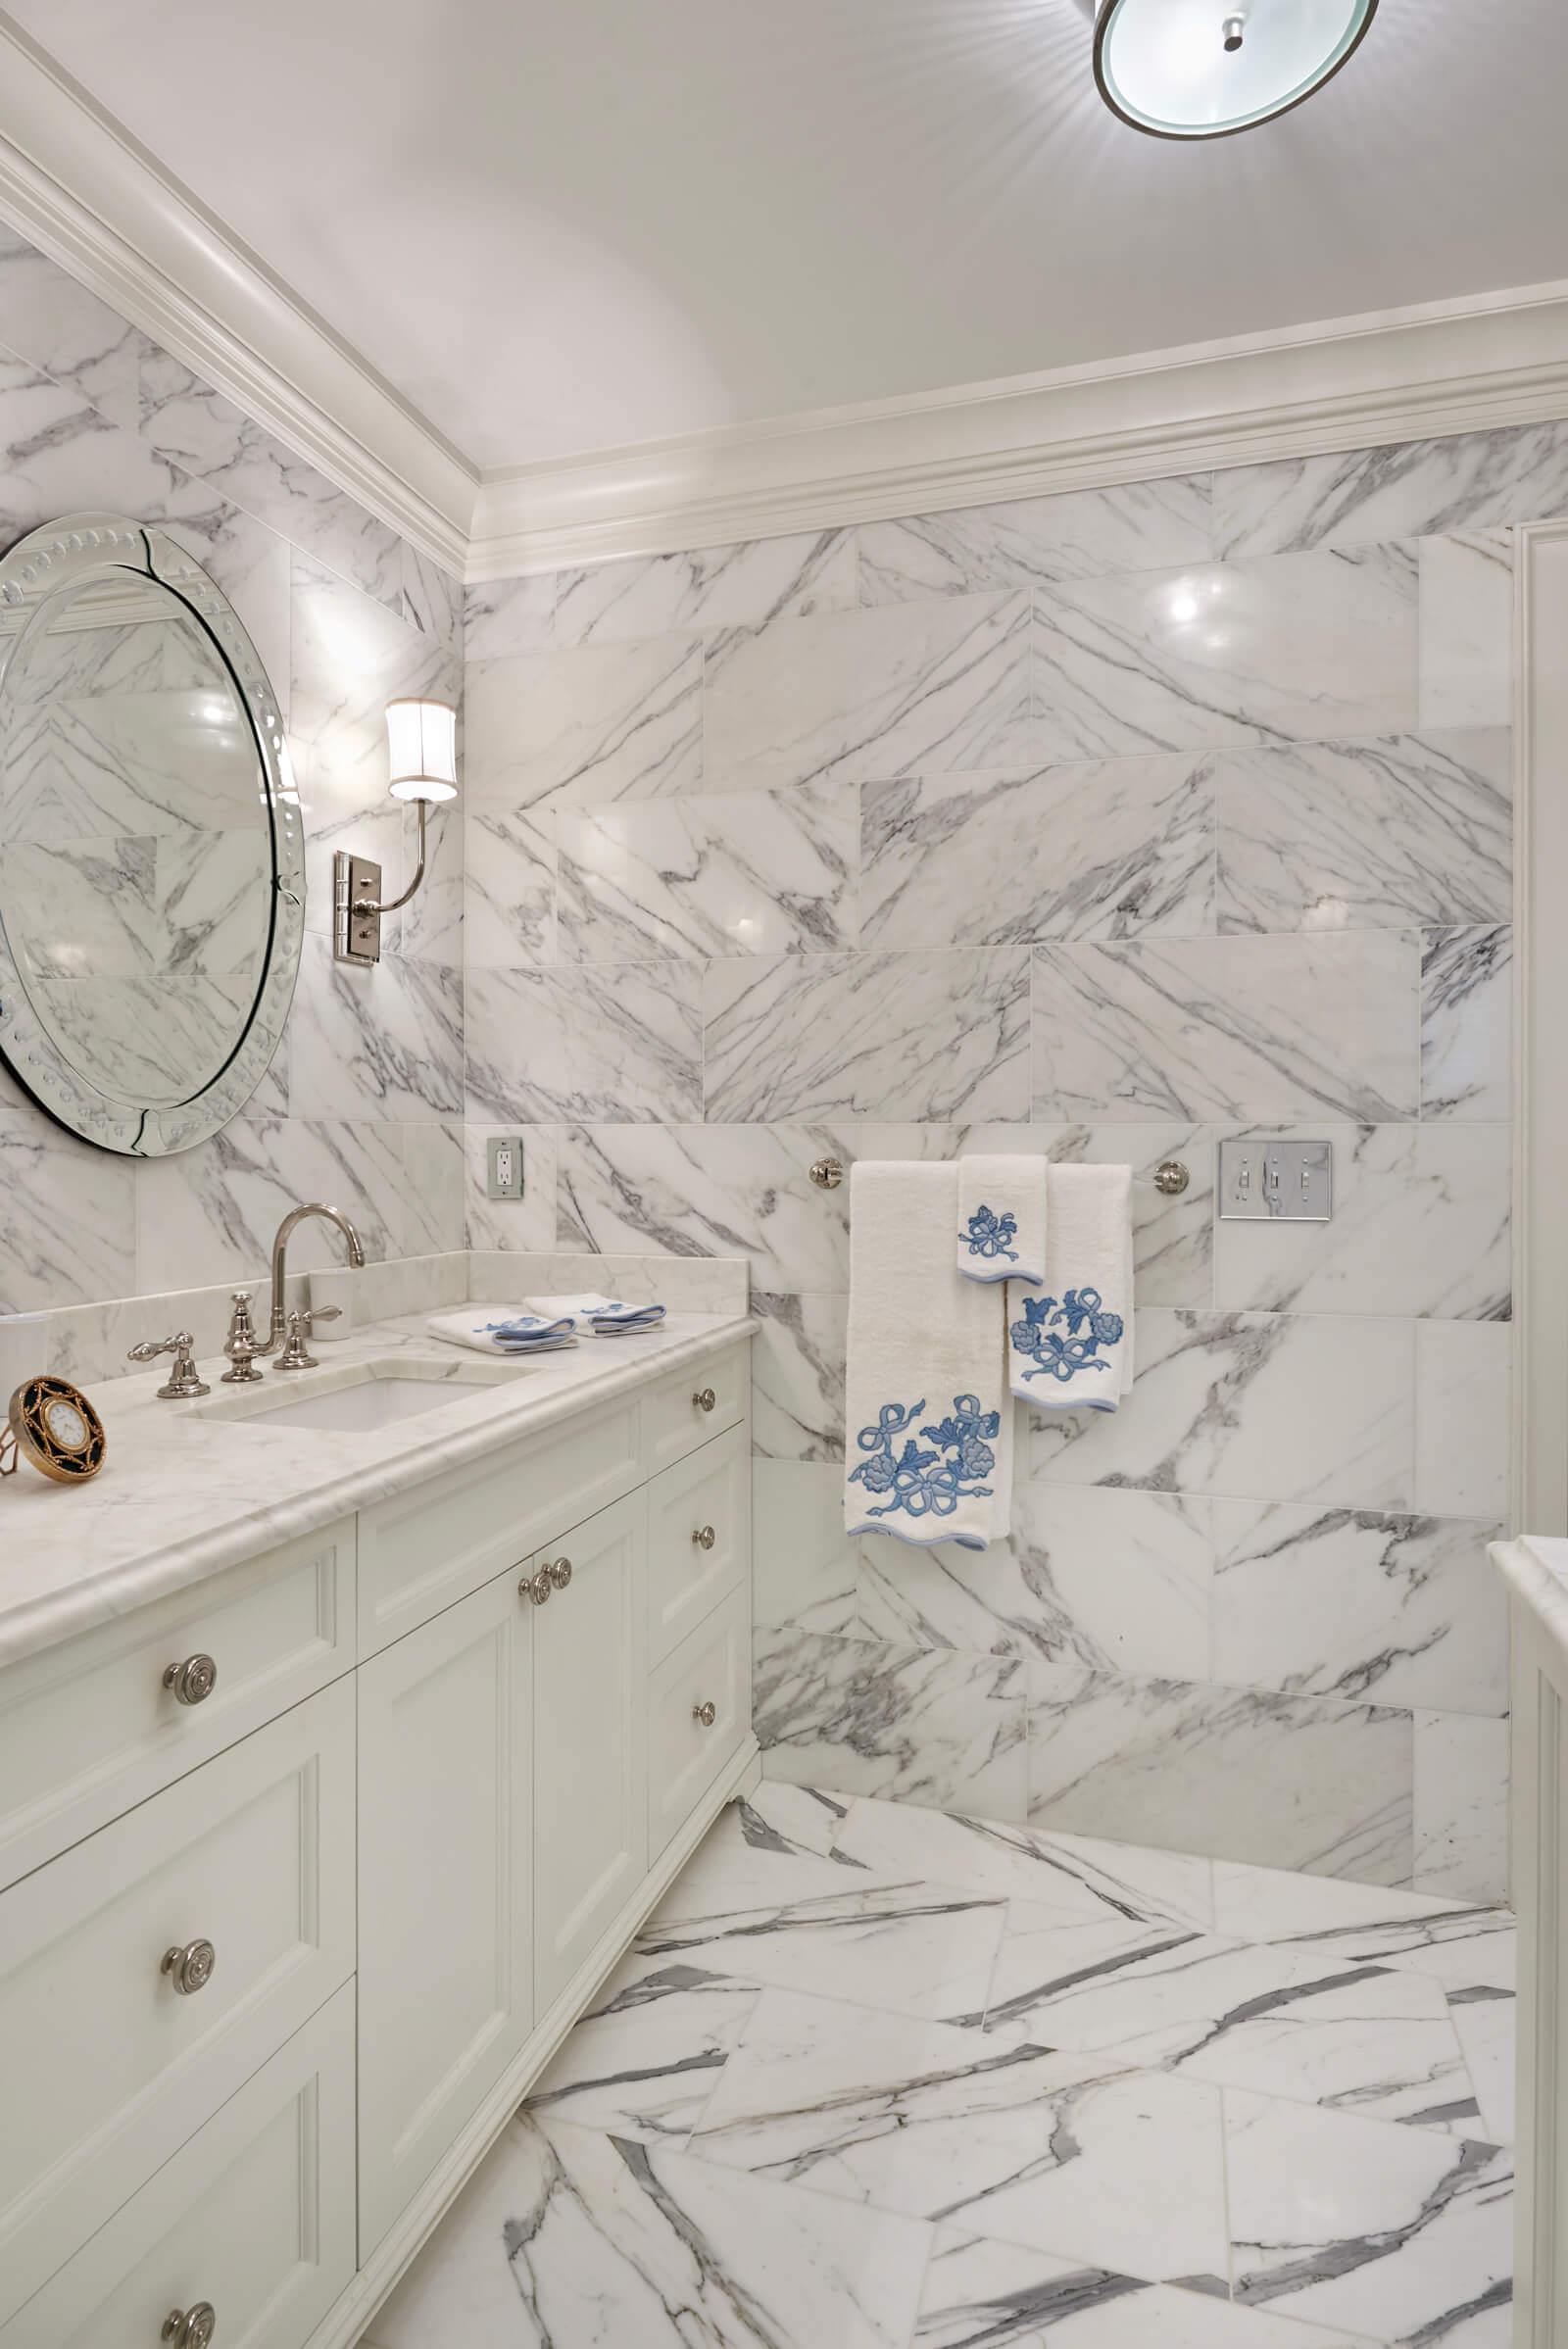 Calacatta Marble Floor and Wall Tile